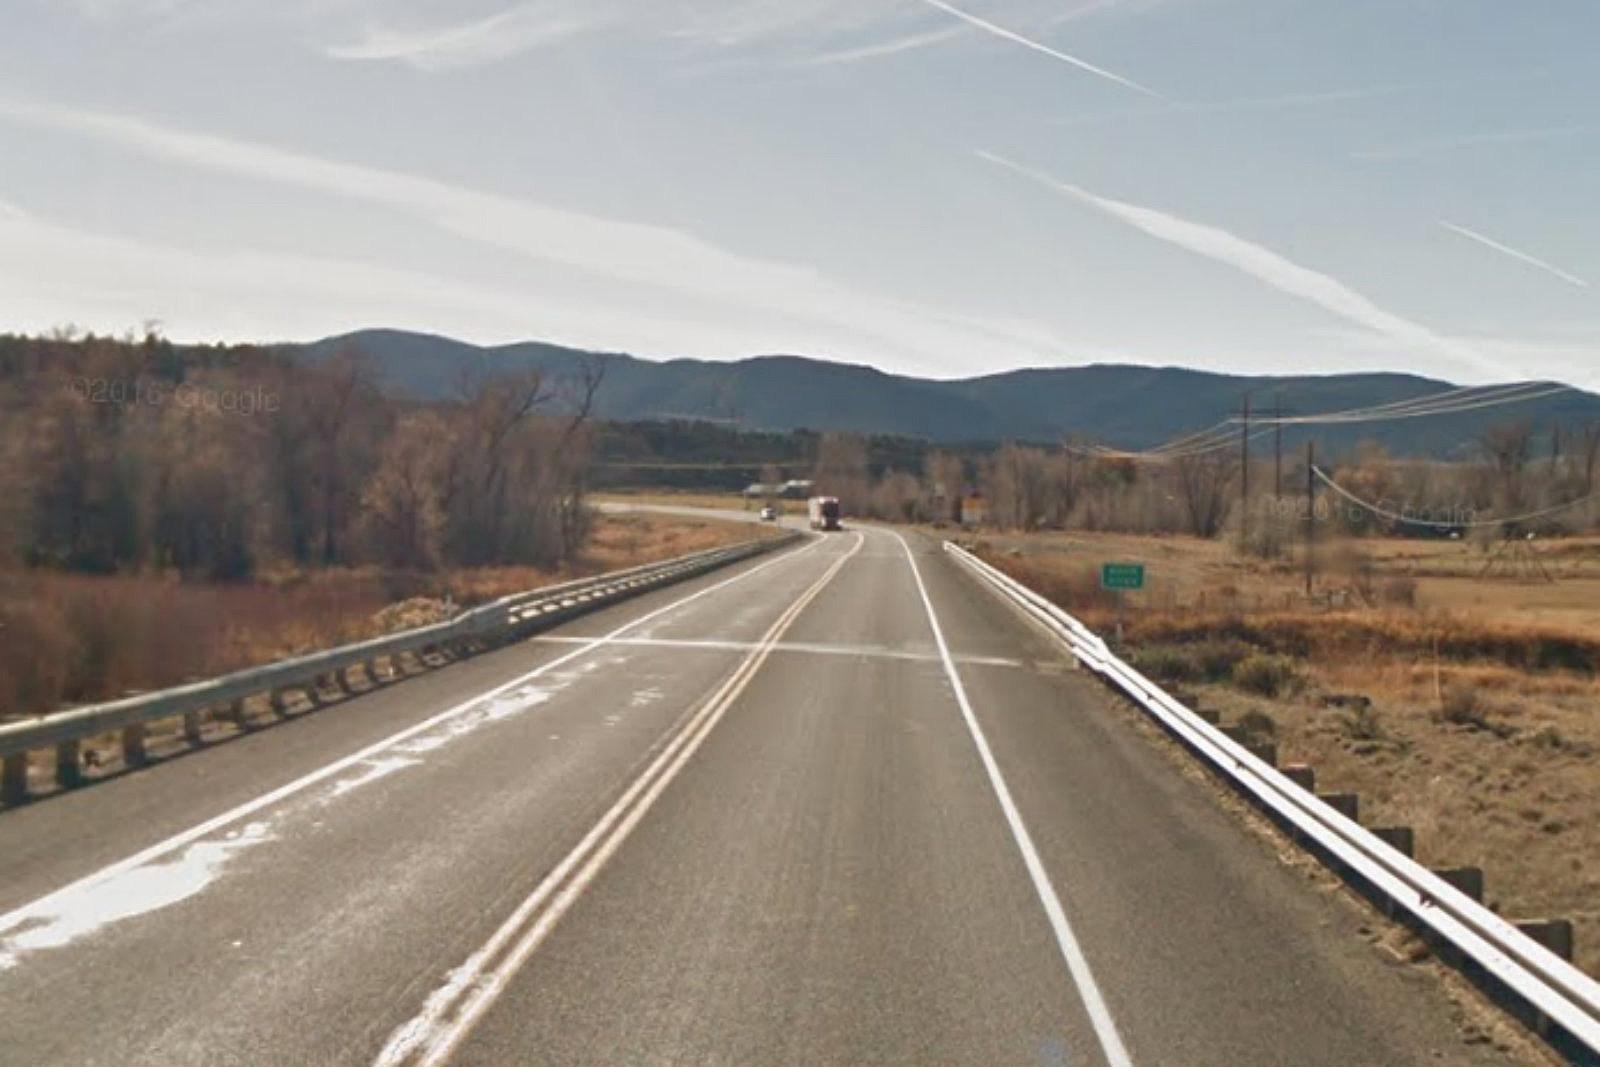 Google Street View -highway 13